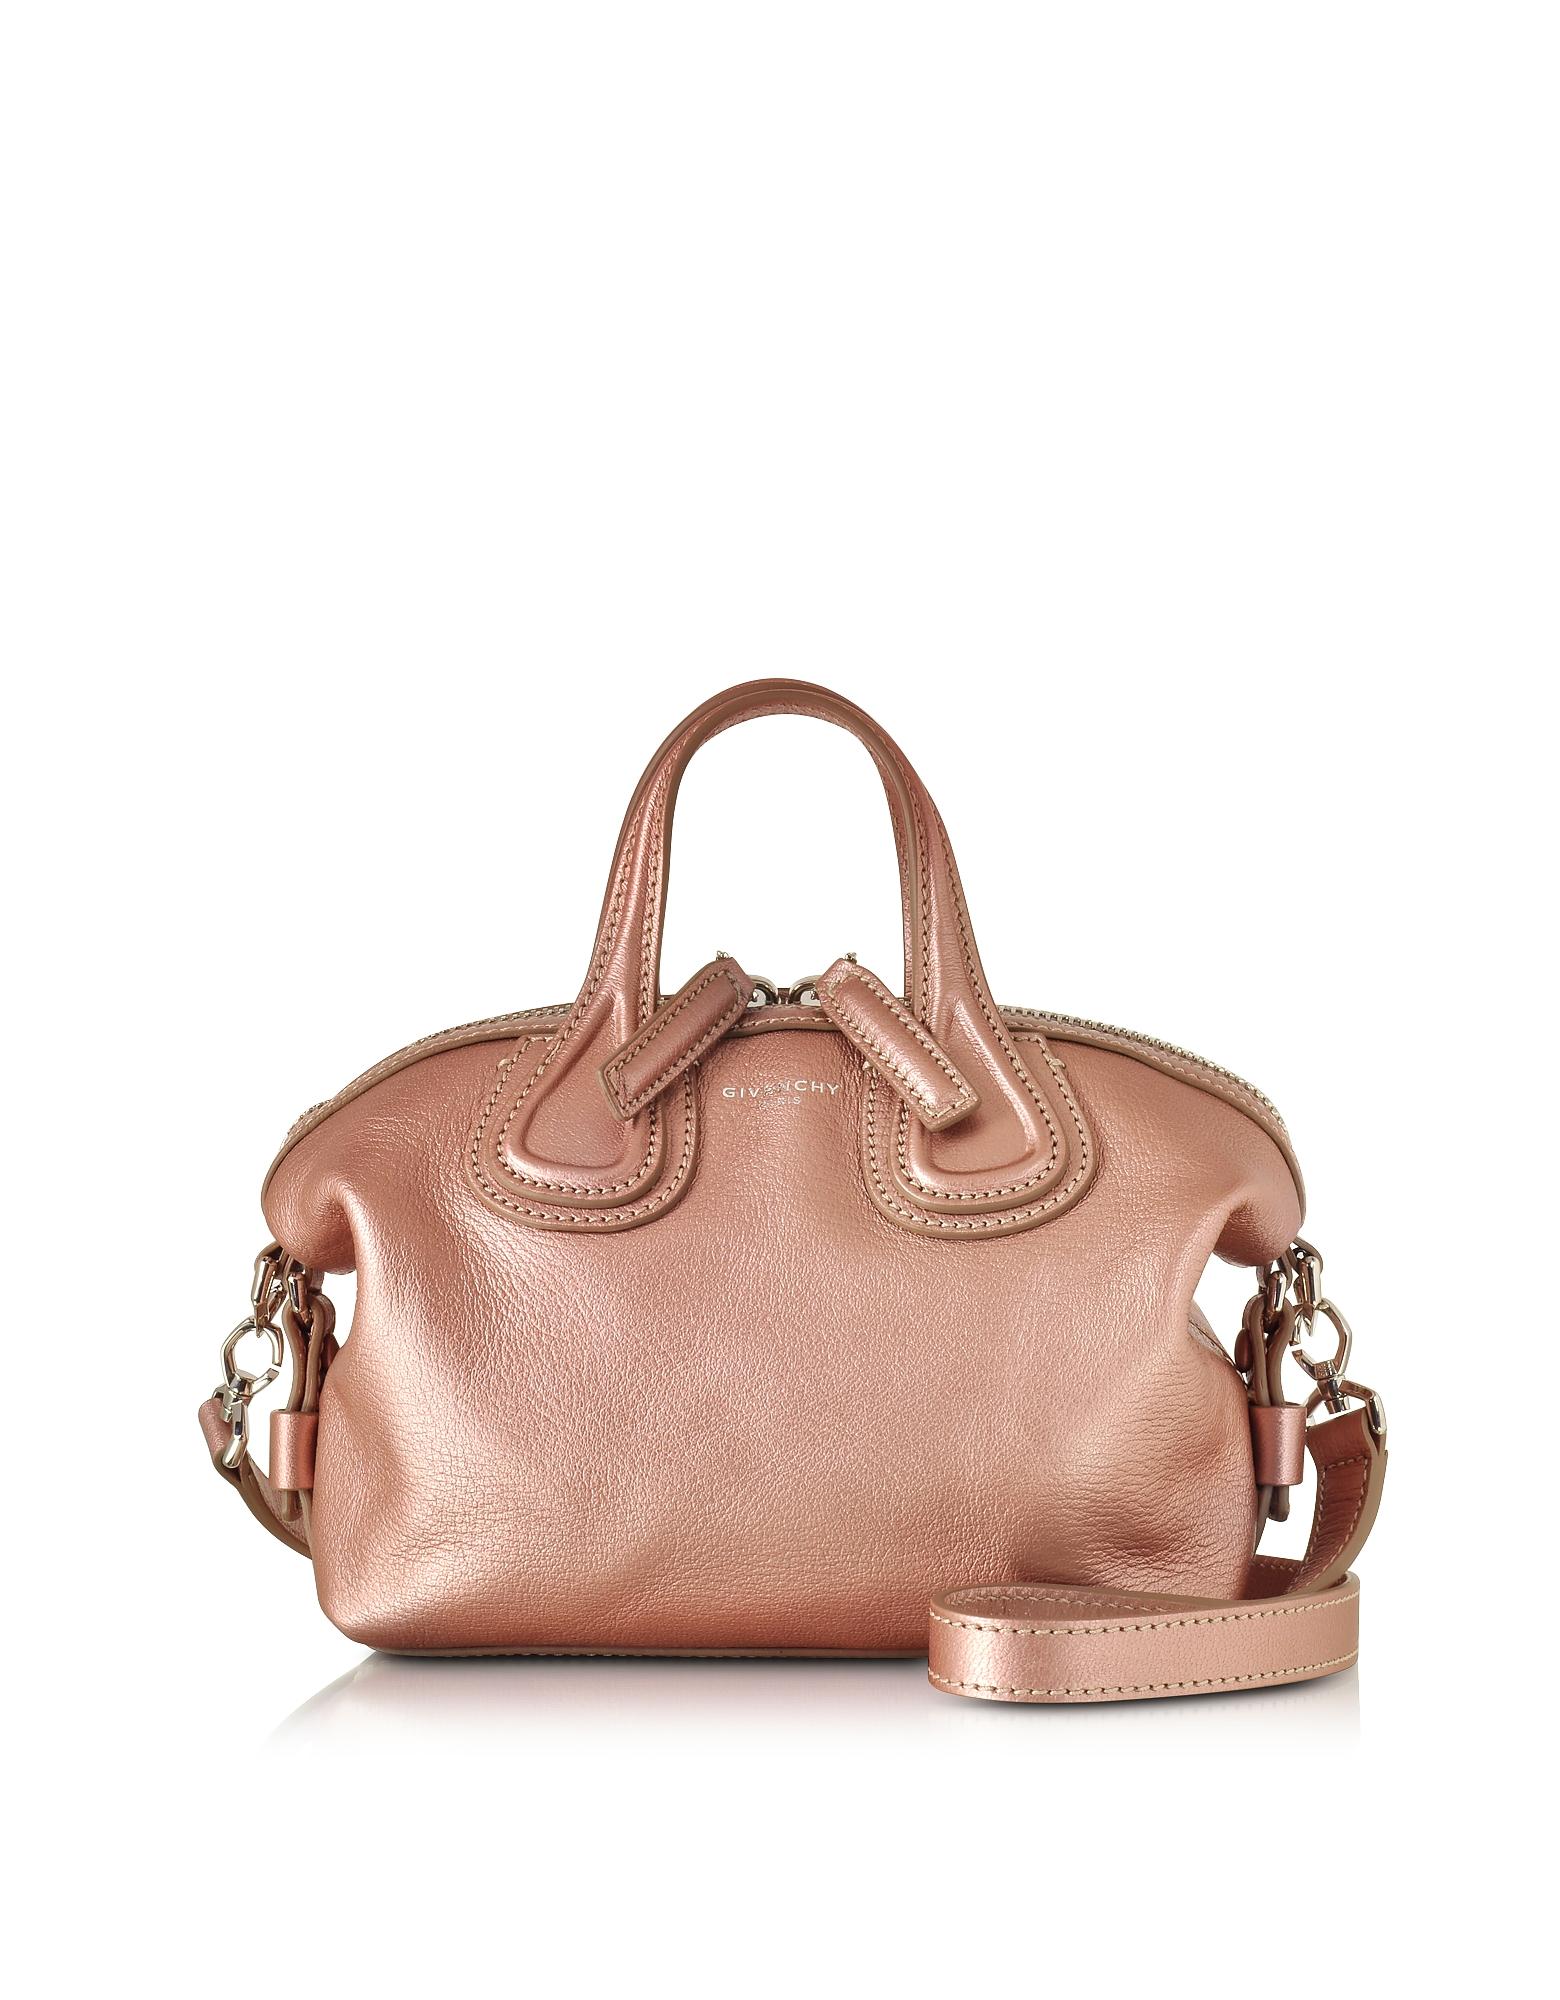 Givenchy Nightingale Micro - Светло-Розовая Кожаная Сумка